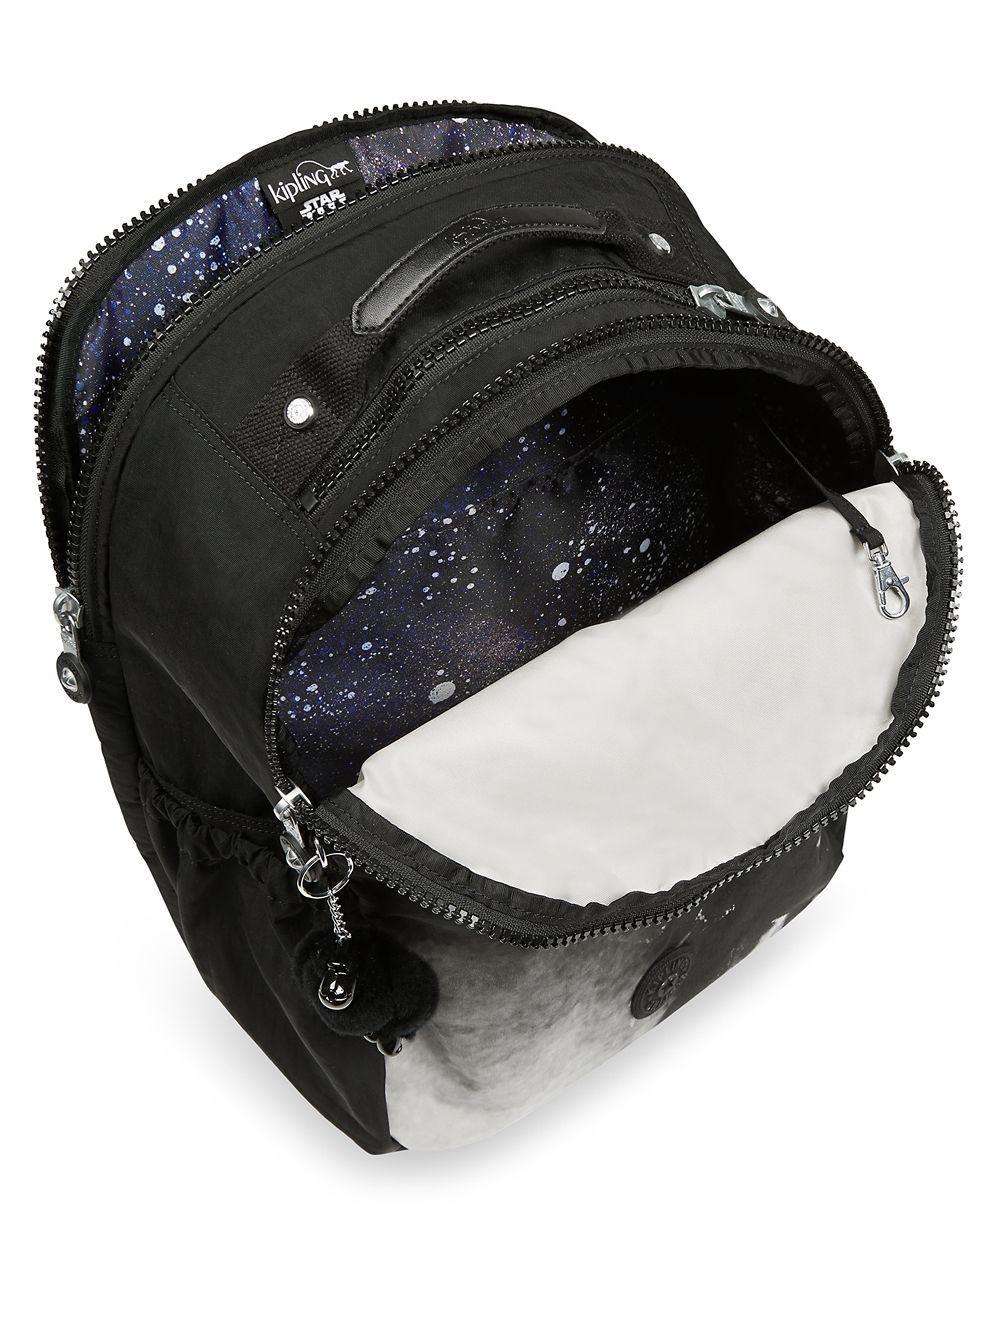 4388ffa6f Kipling Star Wars Seoul Extra Large Laptop Backpack in Black - Lyst